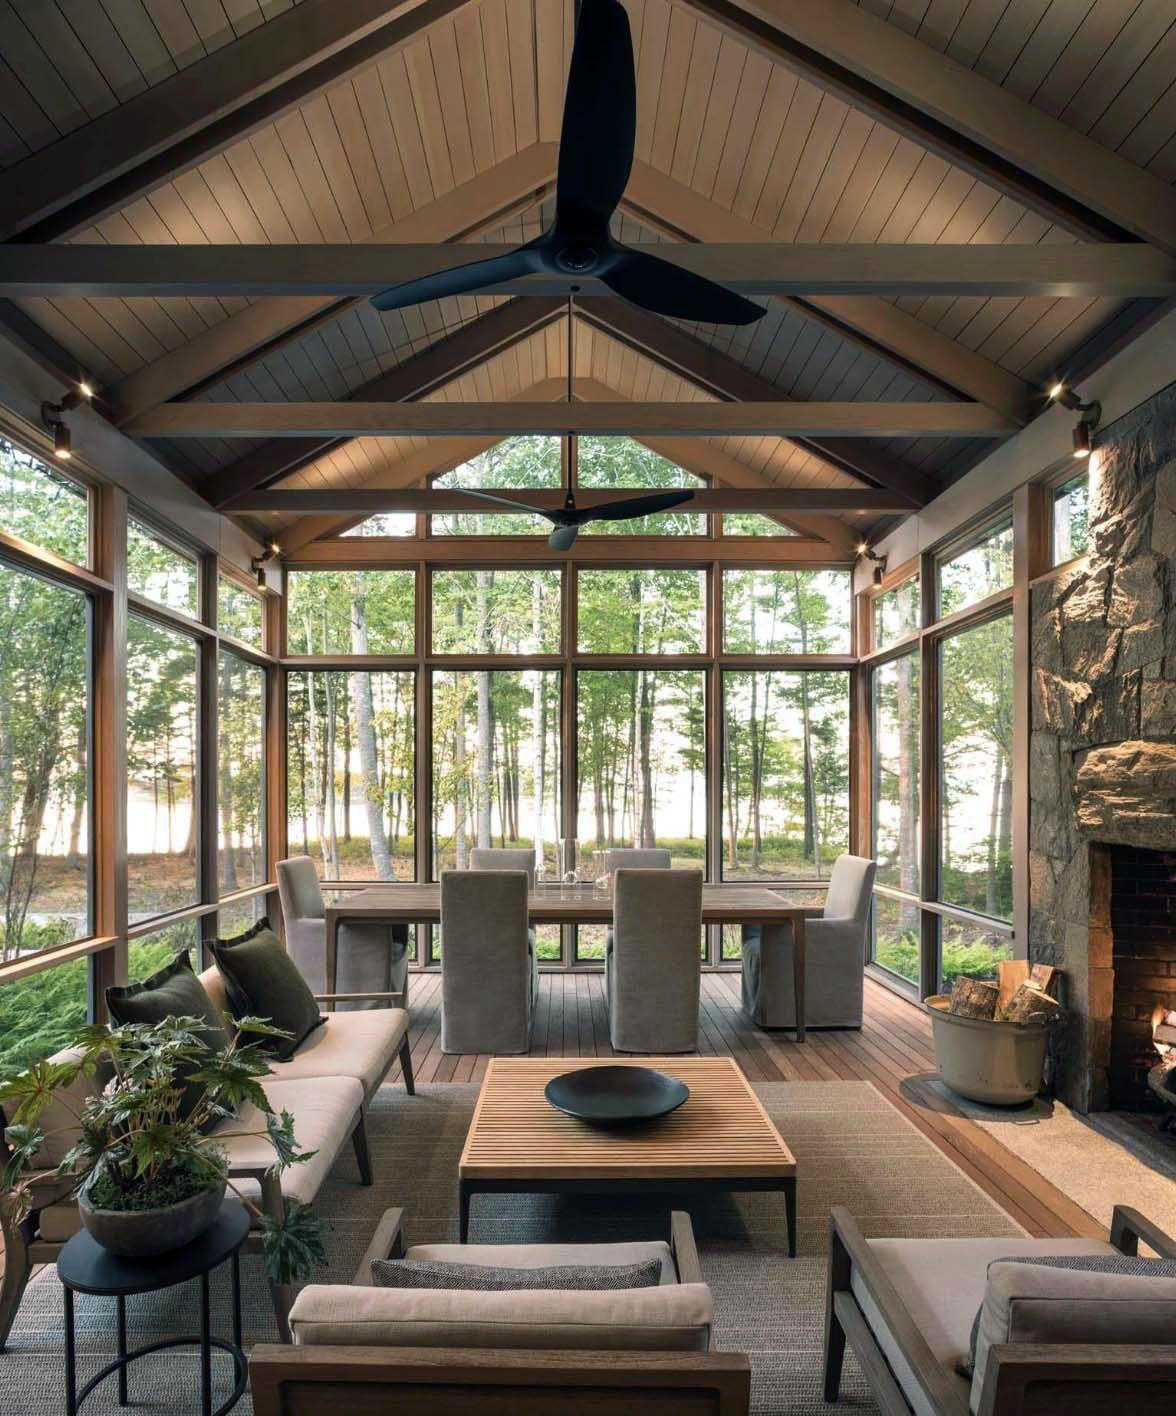 10 DIY Small Backyard Ideas That Make a Big Statement ...